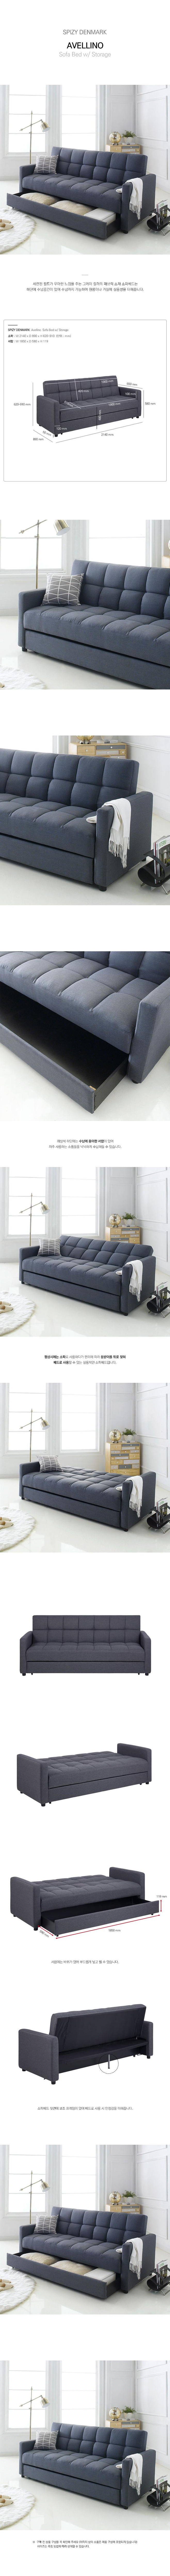 2_3_Avellino-Sofa-Bed.jpg